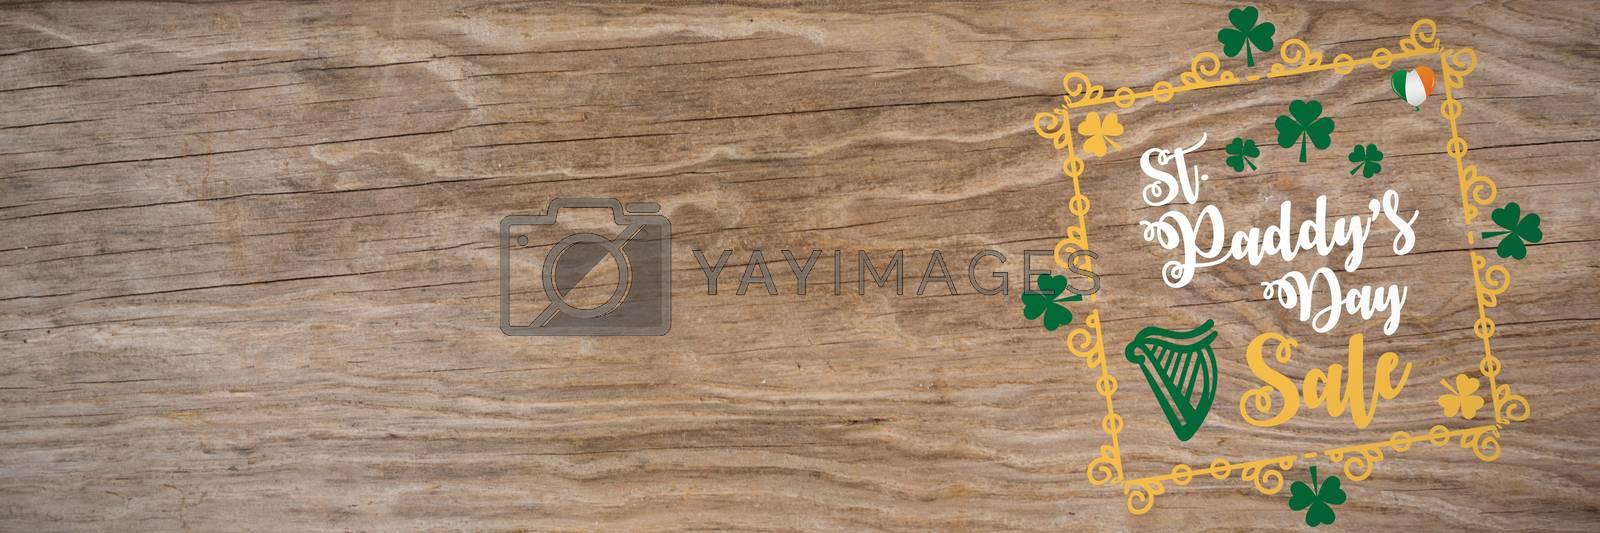 Digital composite of St Patricks Day Greeting